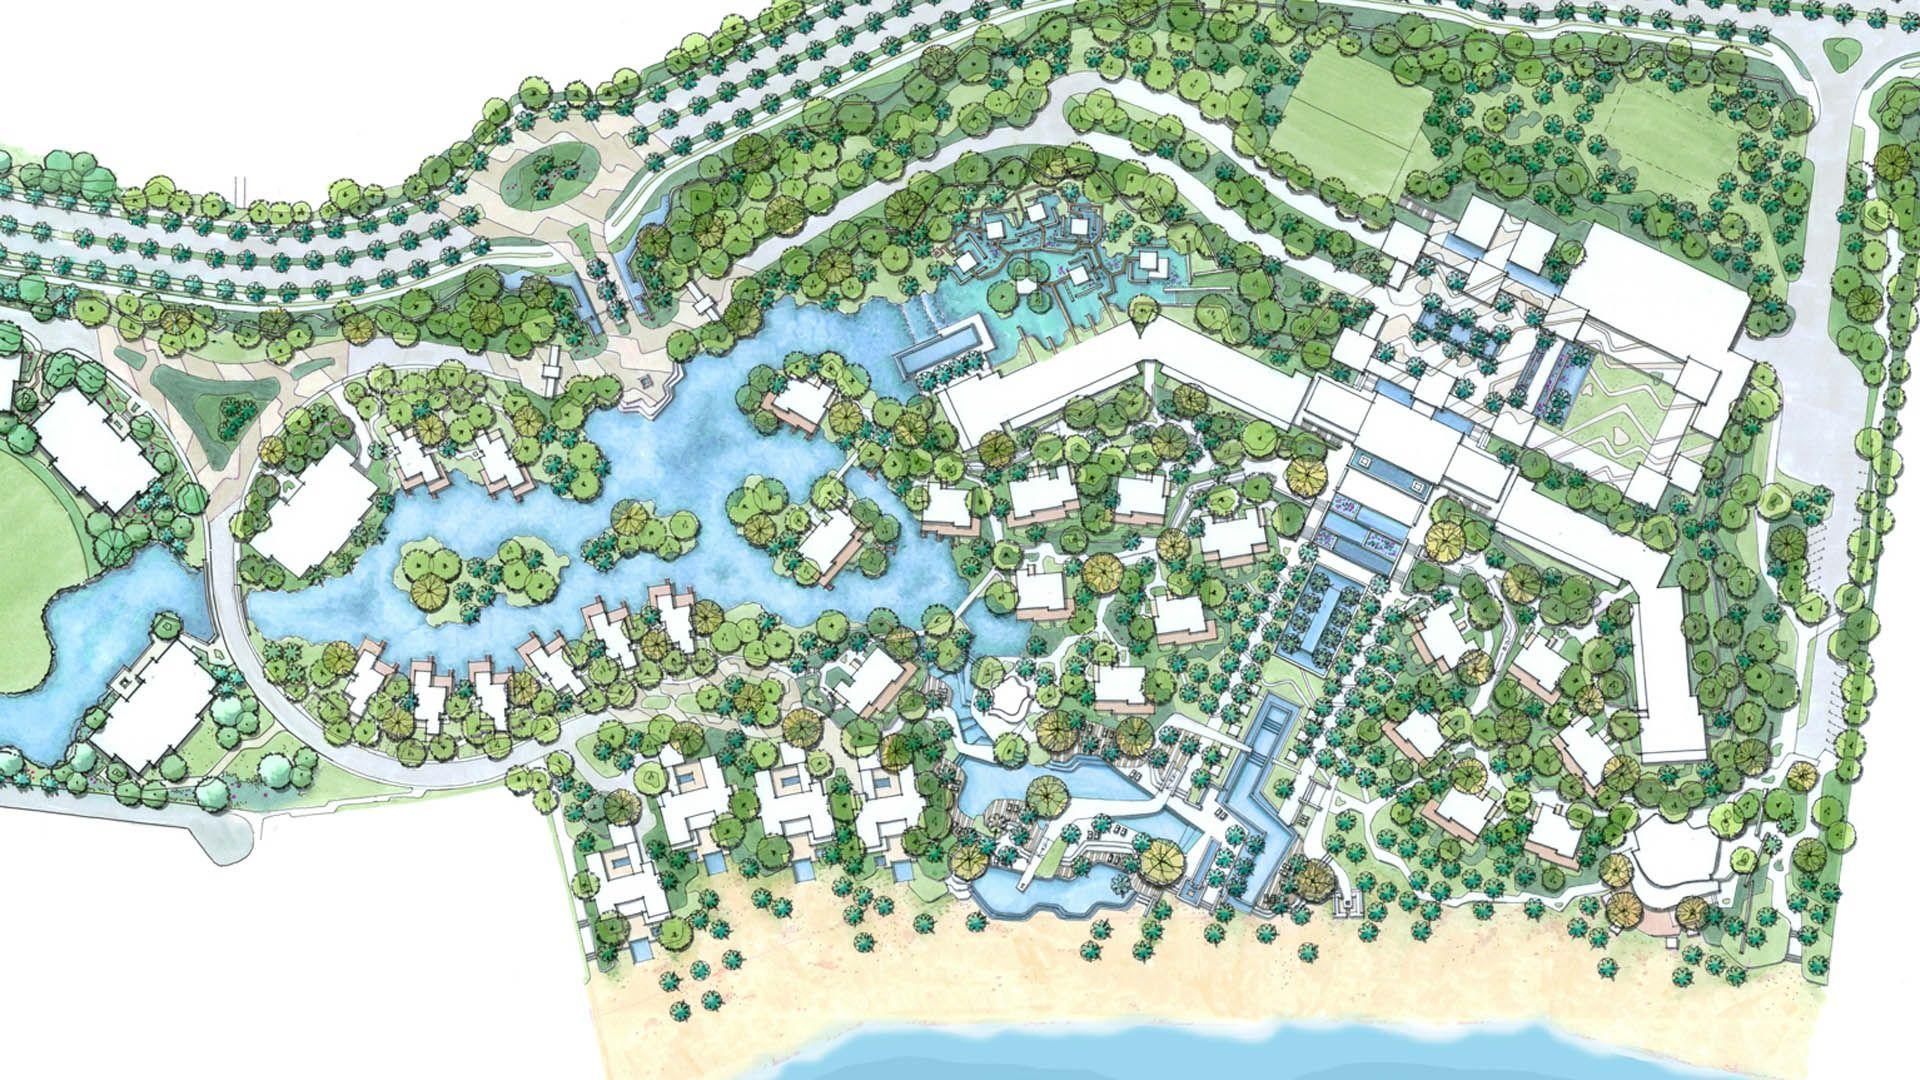 Pe Cabo De Santo Agostinho Reserva Do Paiva Four Seasons Paiva Hotel Resort Landscape Plans Resort Plan Landscape Design Plans